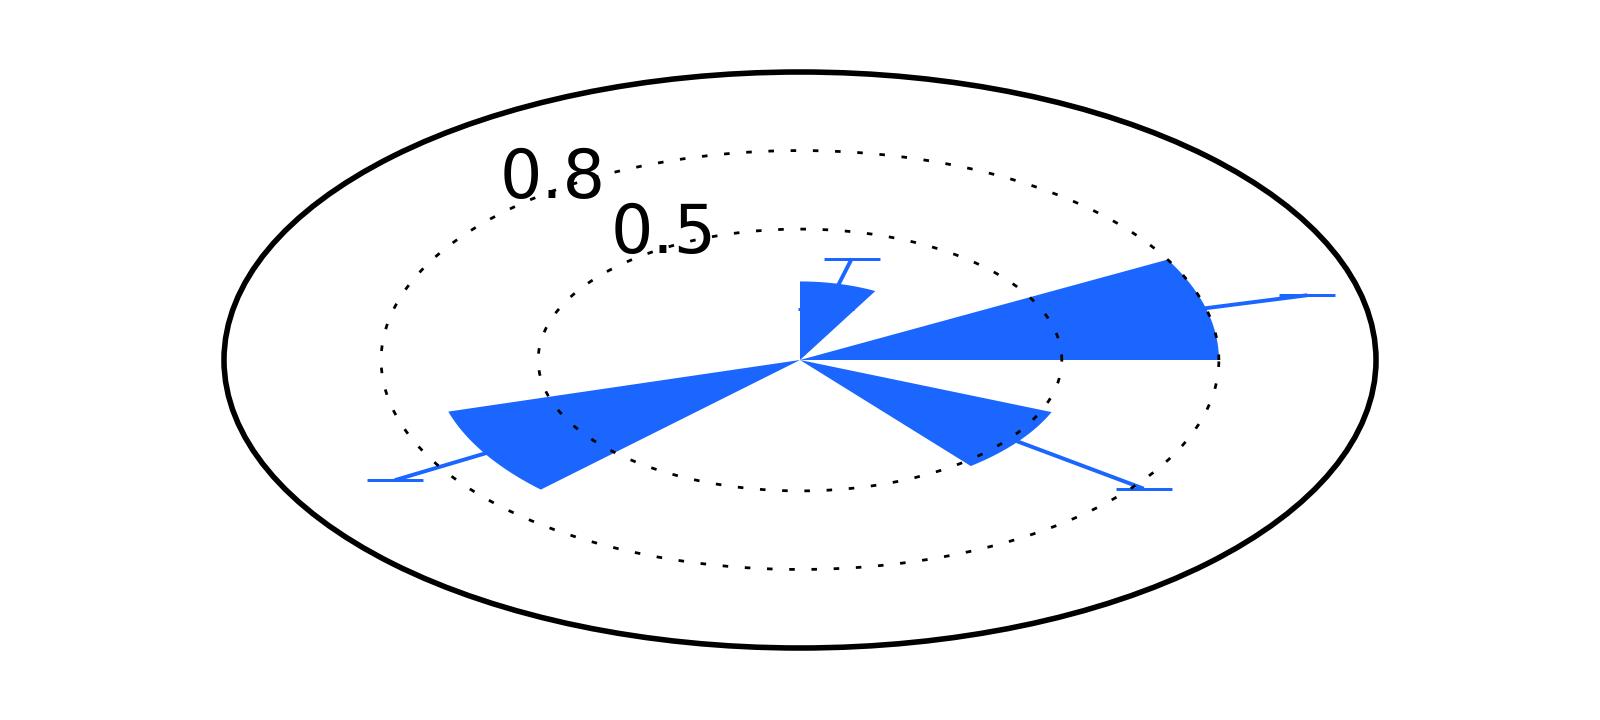 Matplotlib and error bars in polar coordinates